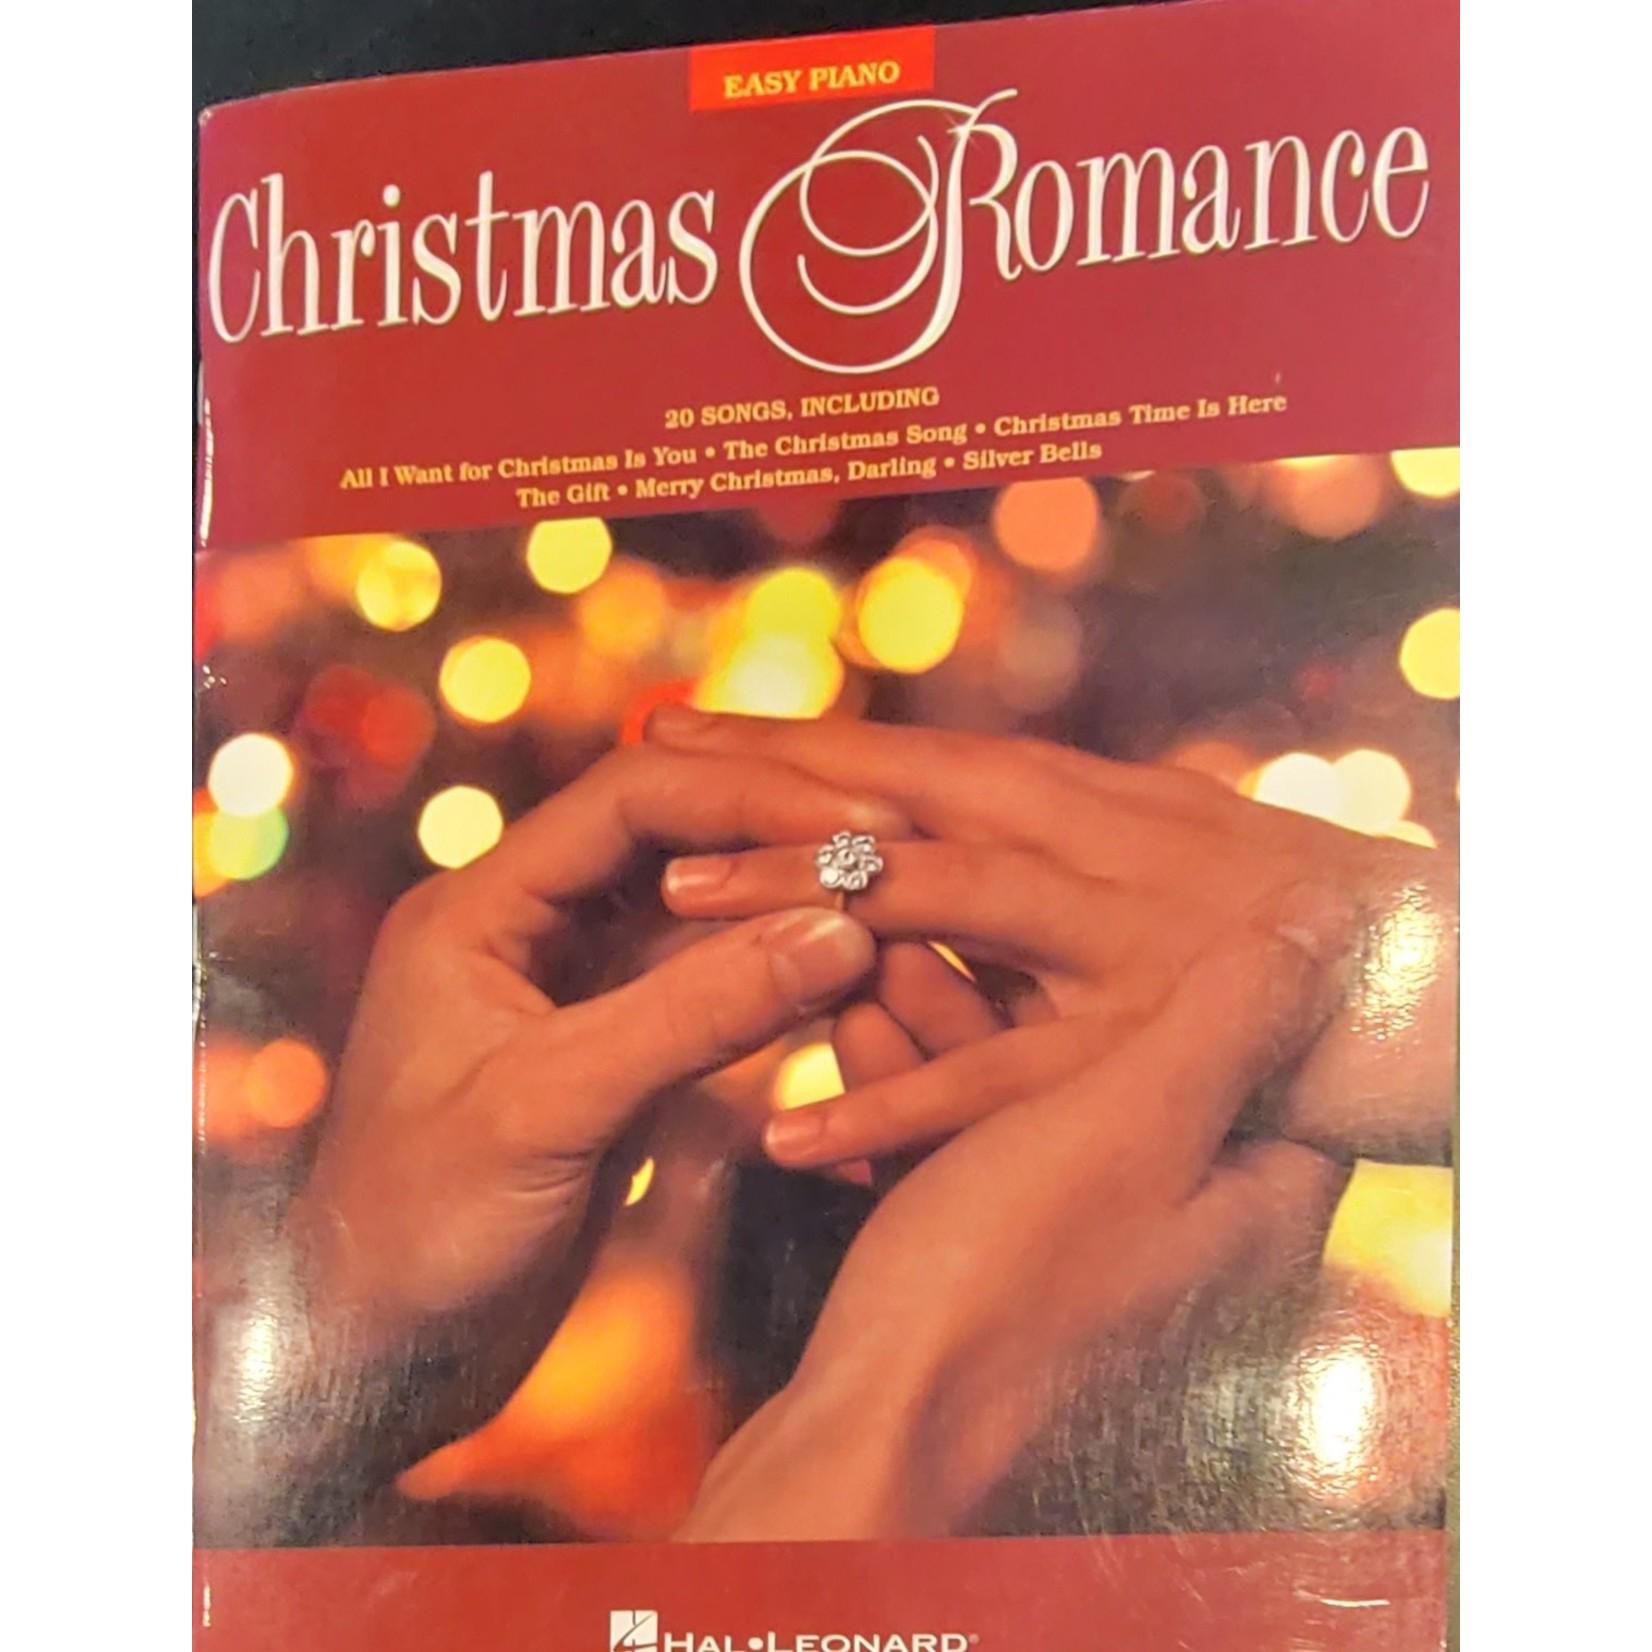 HAL LEONARD LIVRE CHRISTMAS ROMANCE/EASY PIANO